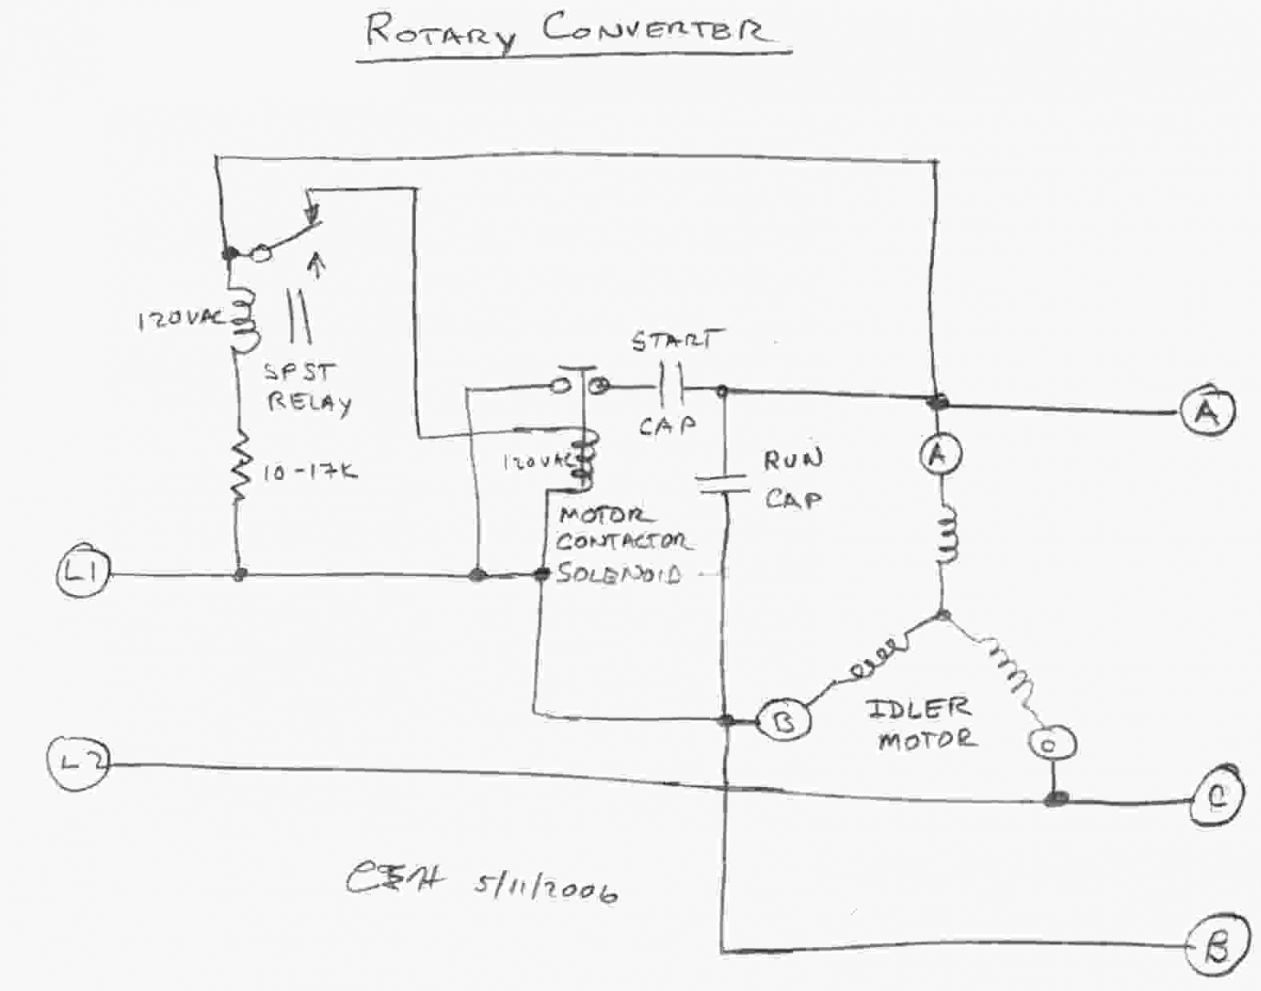 phase converter wiring diagram Download-Elegant Single Phase Motor Wiring Diagram With Capacitor Unique Single Phase Single Phase To 3 Phase 8-r